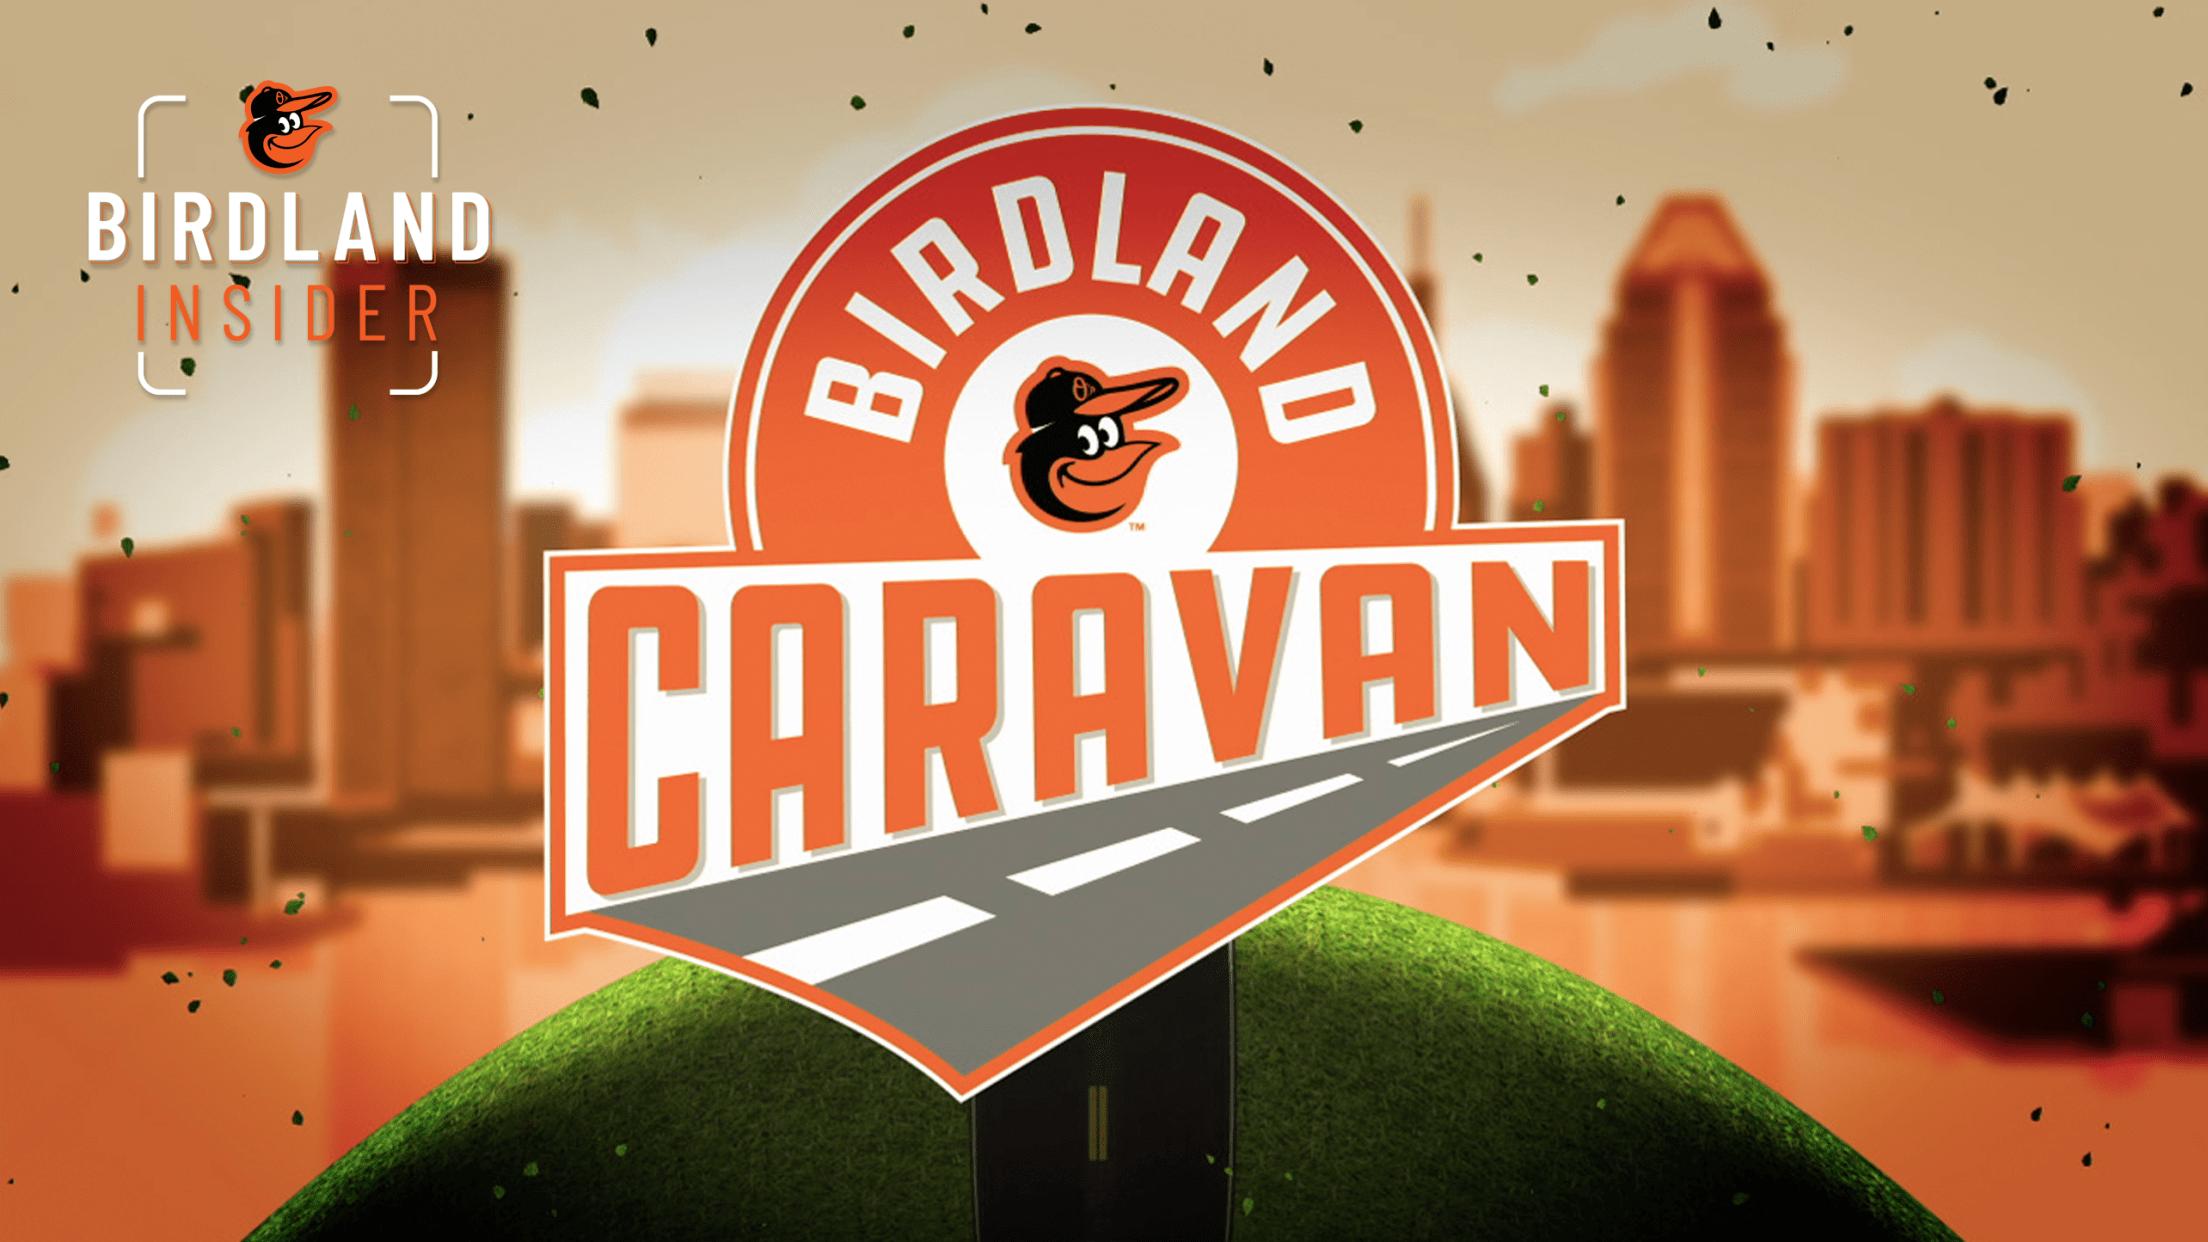 04062020_BirdlandInsider-Caravan